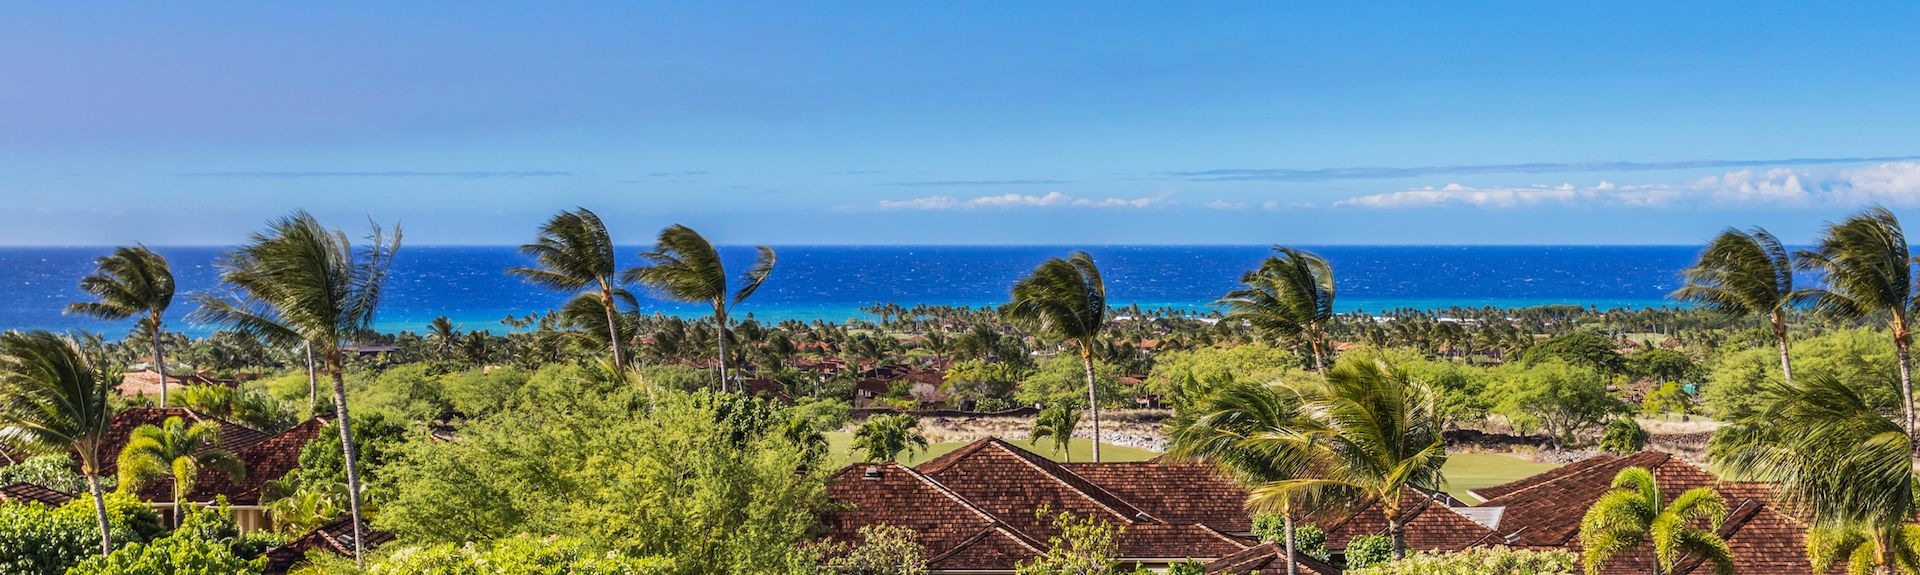 Hualalai Resort (Kailua-Kona, Hawaï, États-Unis d'Amérique)